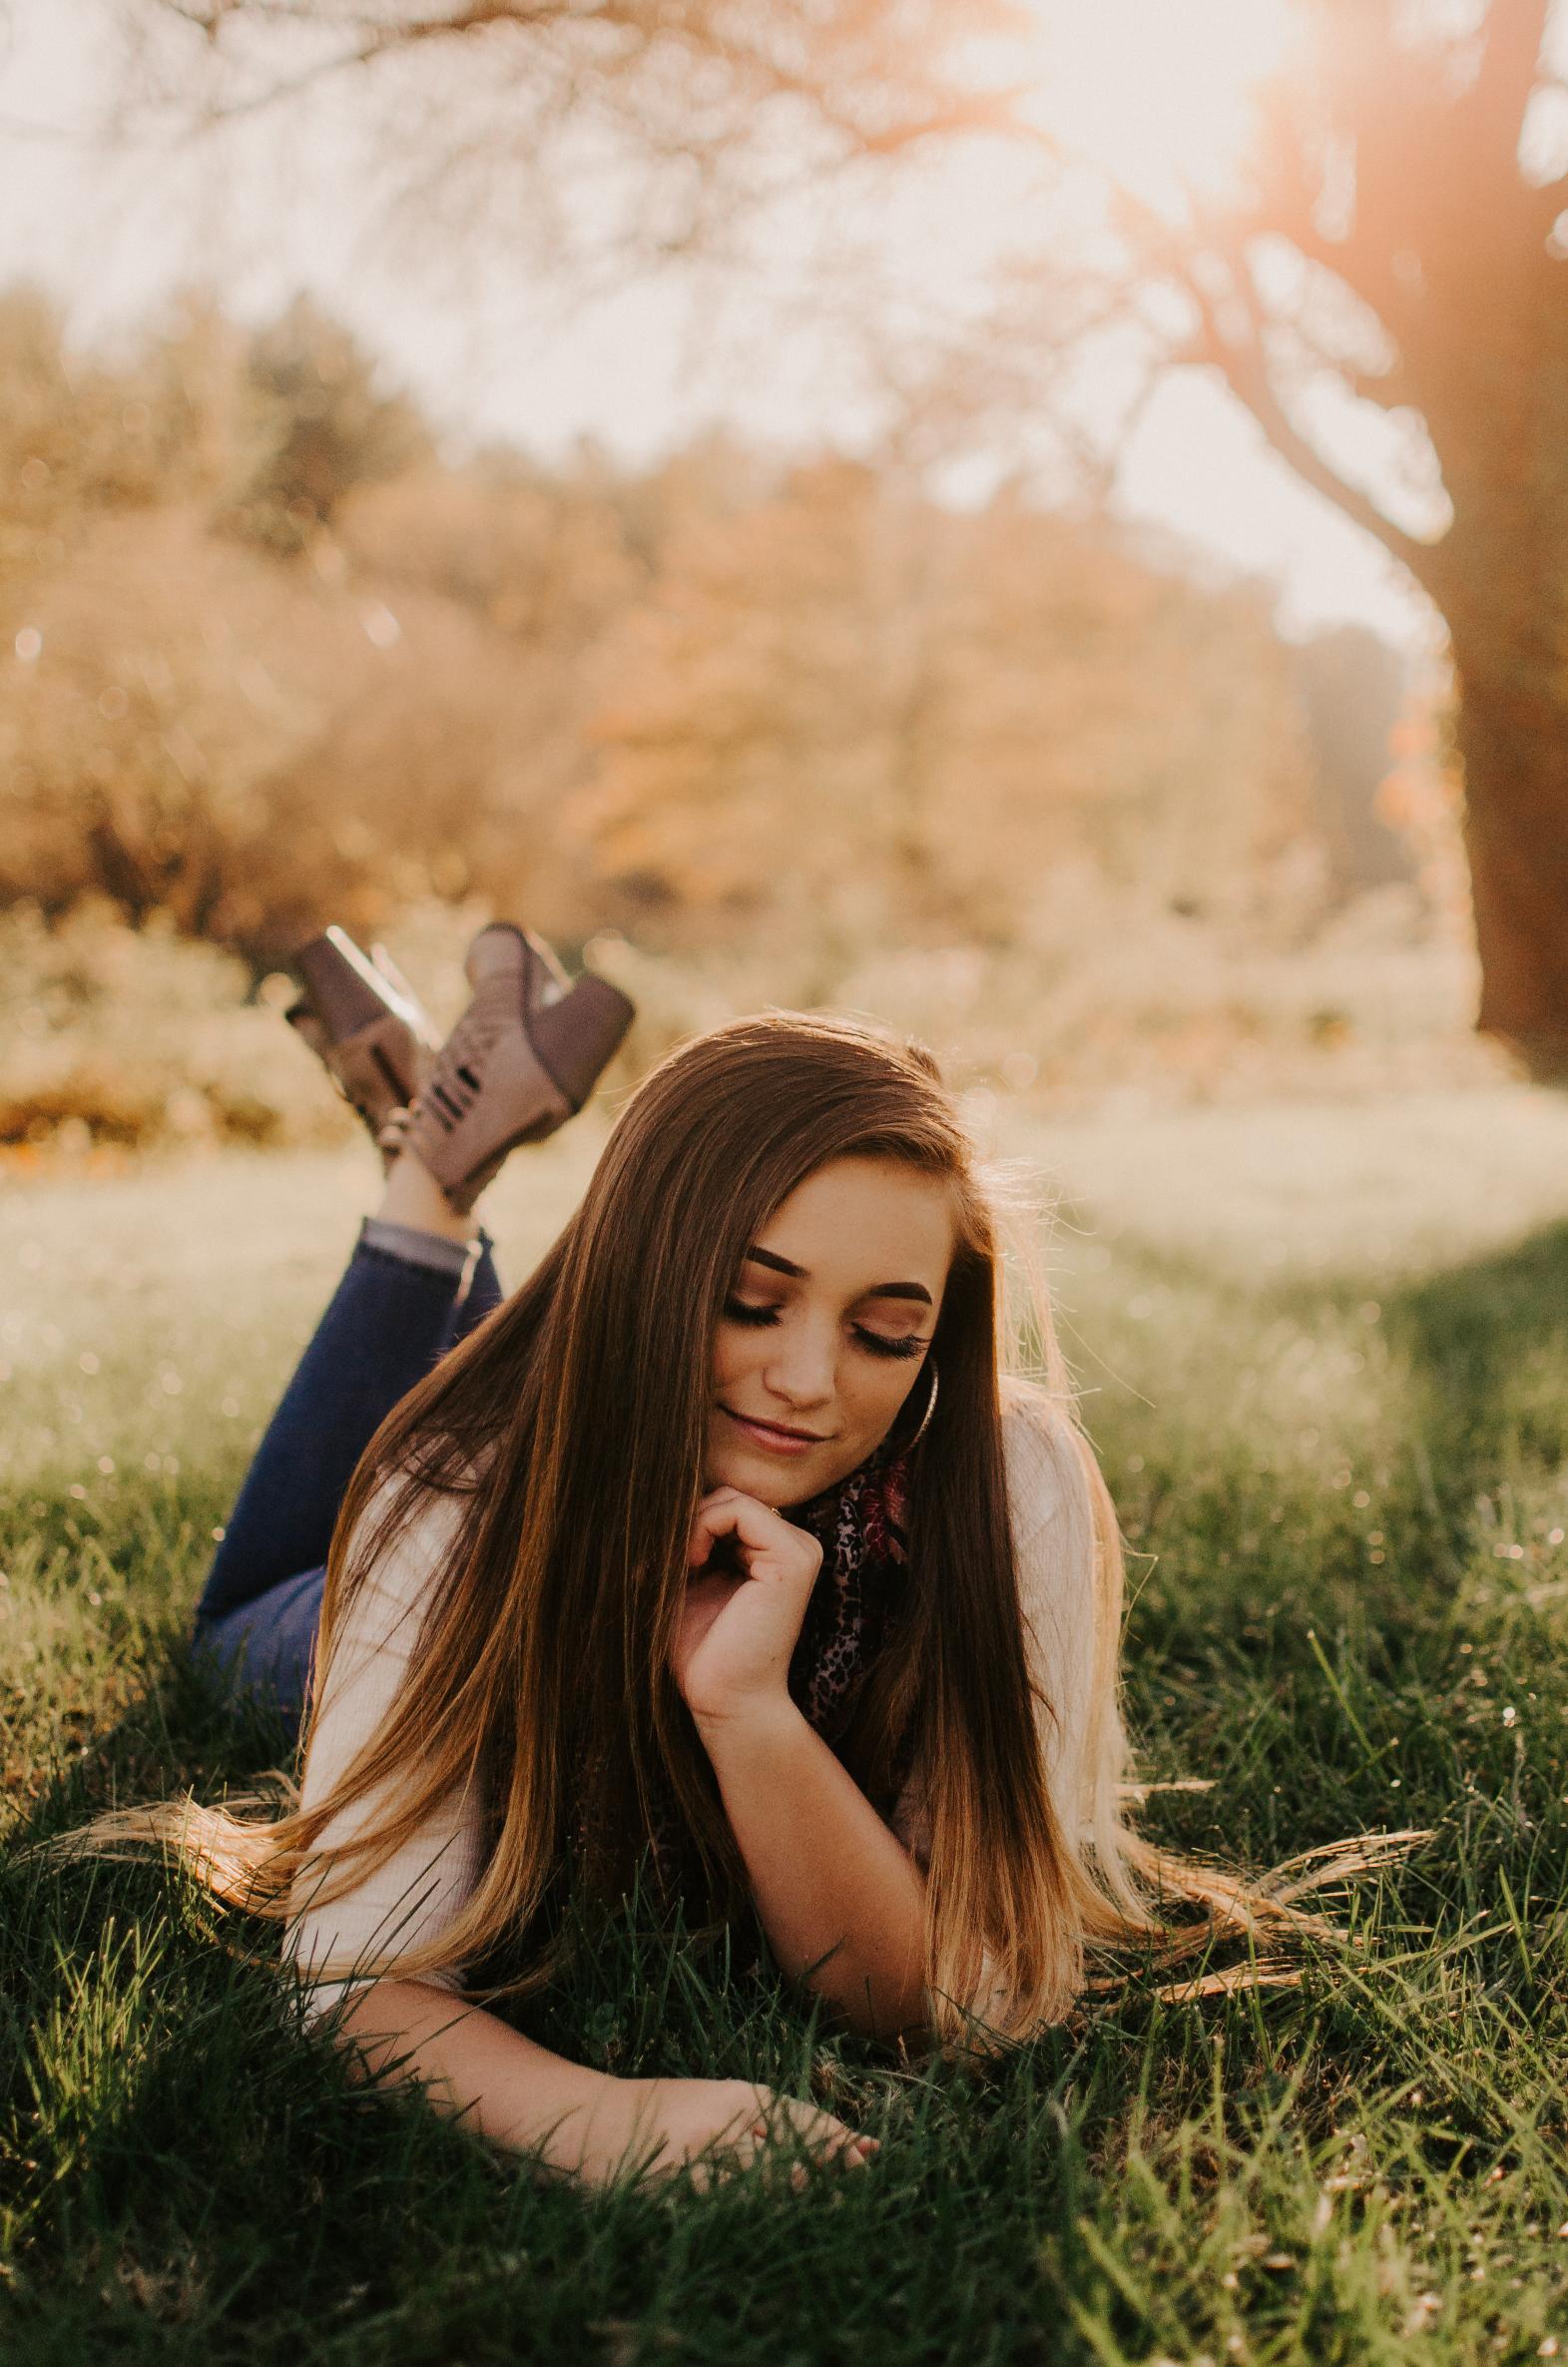 highschool-photography-portraits.jpg.